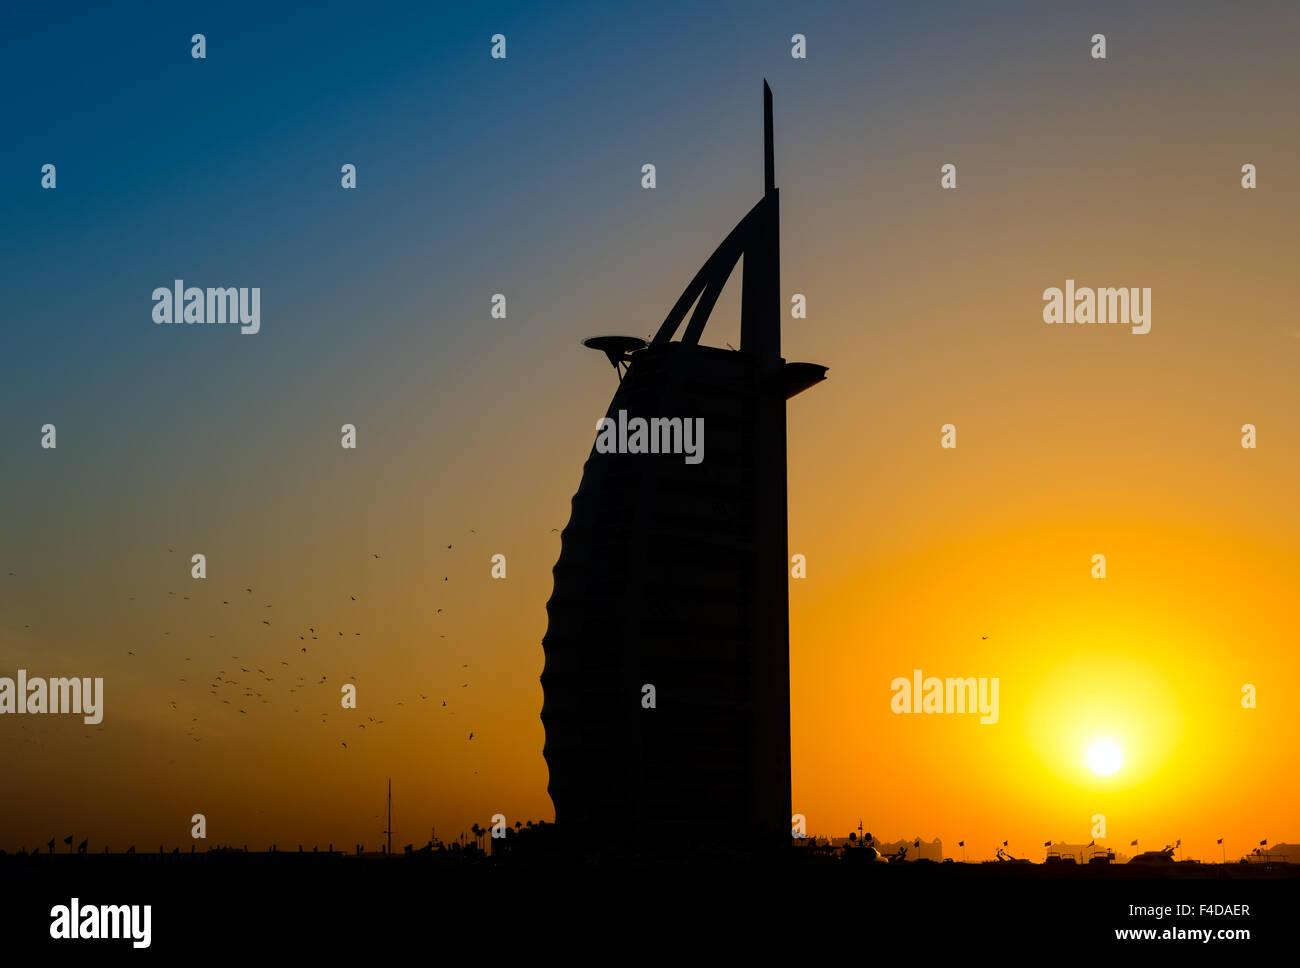 Silhouette des Hotel Burj Al Arab, Dubai, im Sonnenuntergang Stockbild